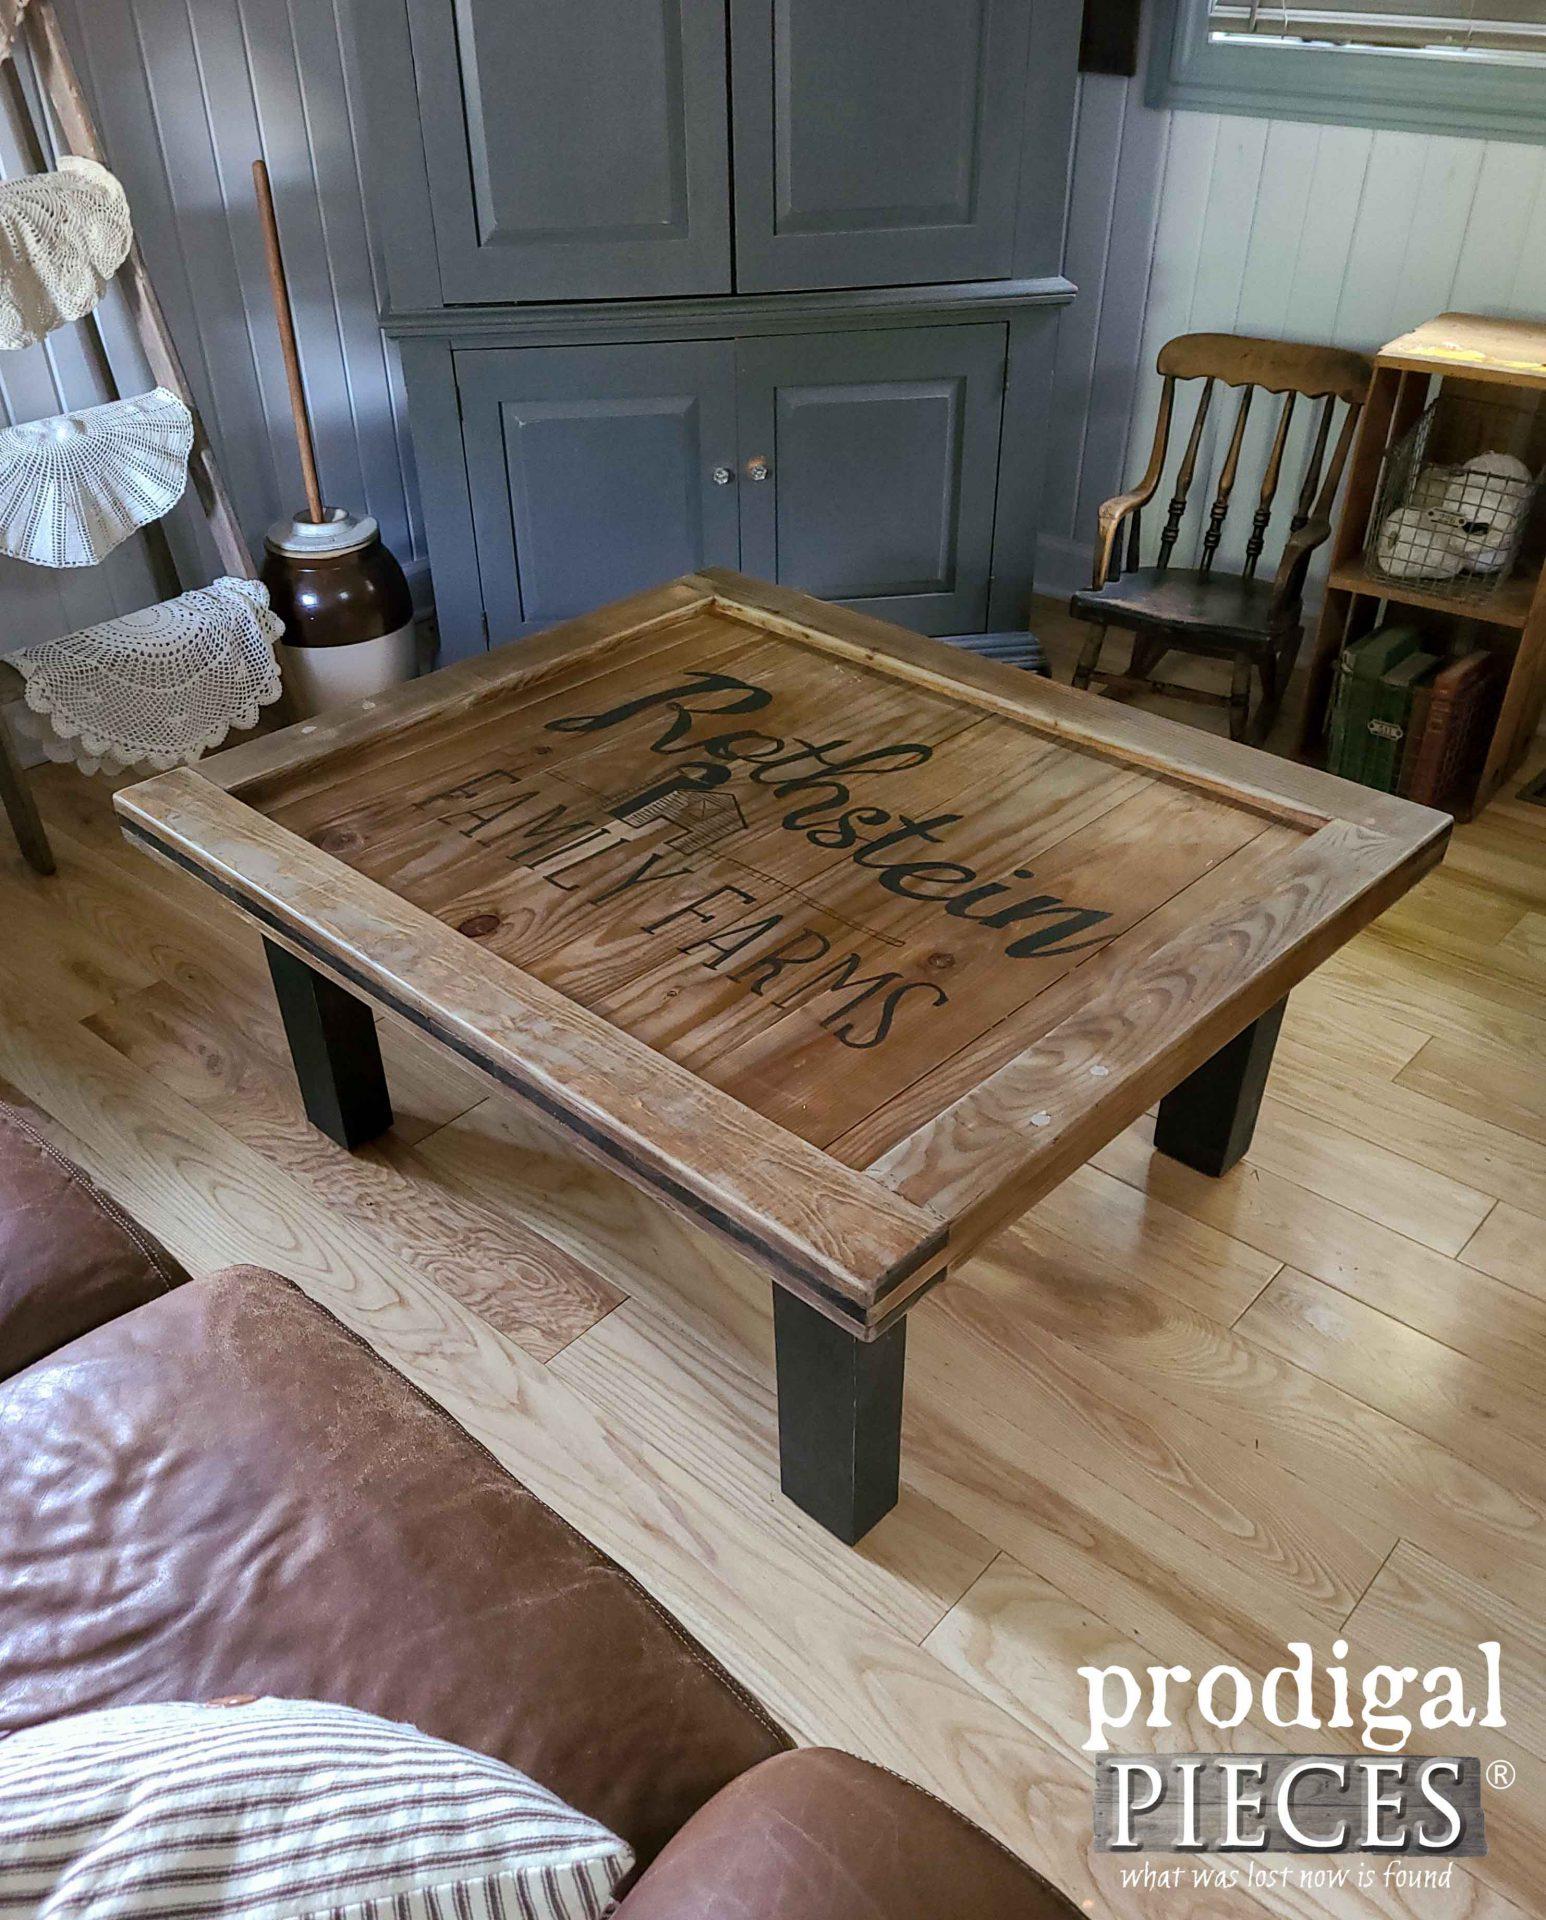 DIY Rustic Farmhouse Coffee Table by Prodigal Pieces   prodigalpieces.com #prodigalpieces #farmhouse #diy #home #homedecor #furniture